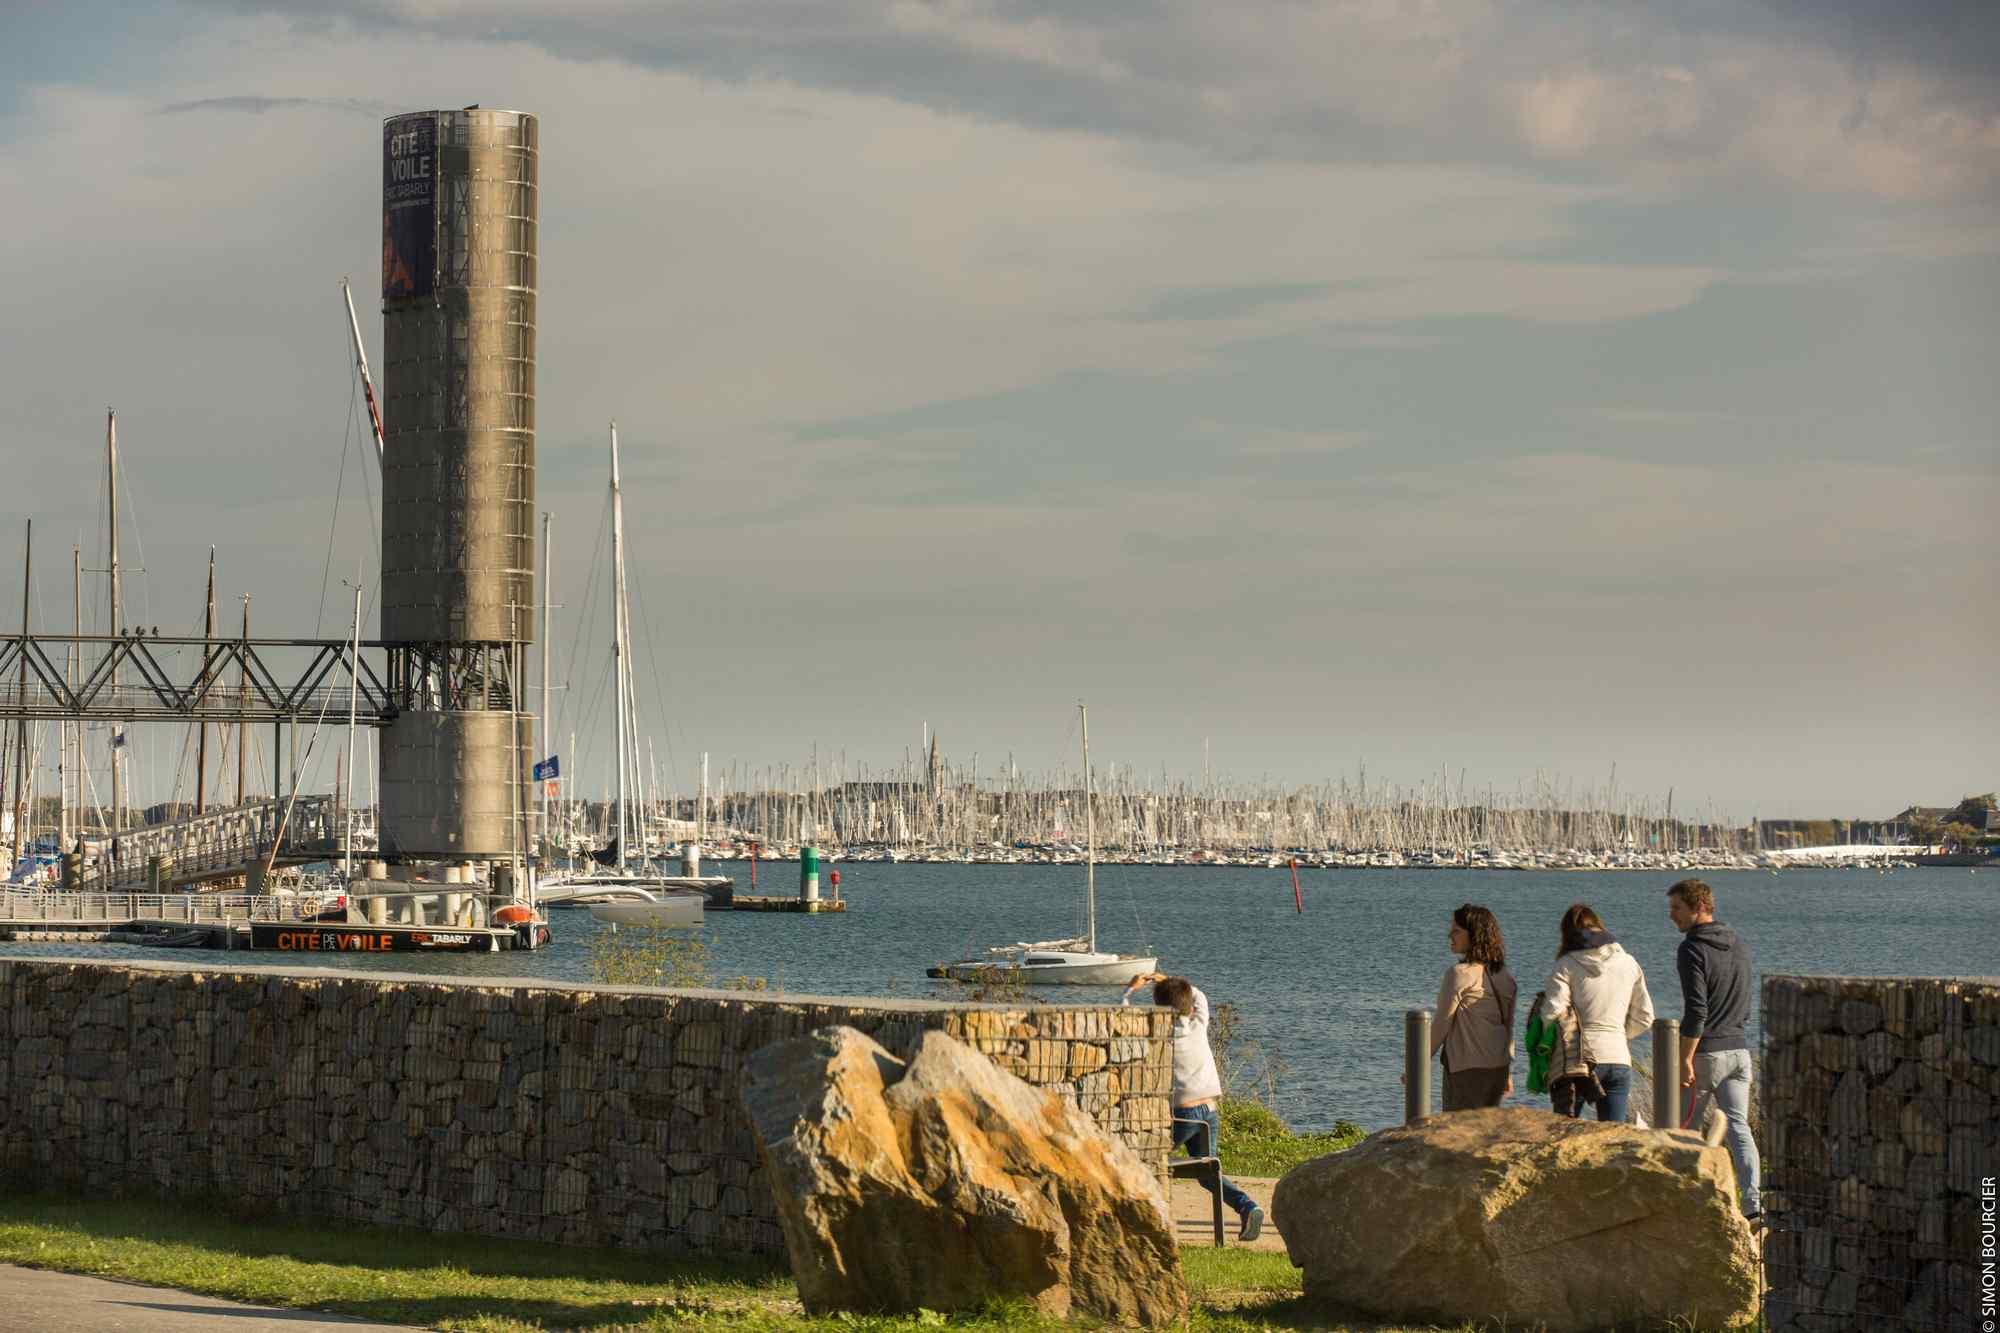 Balade à pieds à Lorient-Morbihan Bretagne Sud